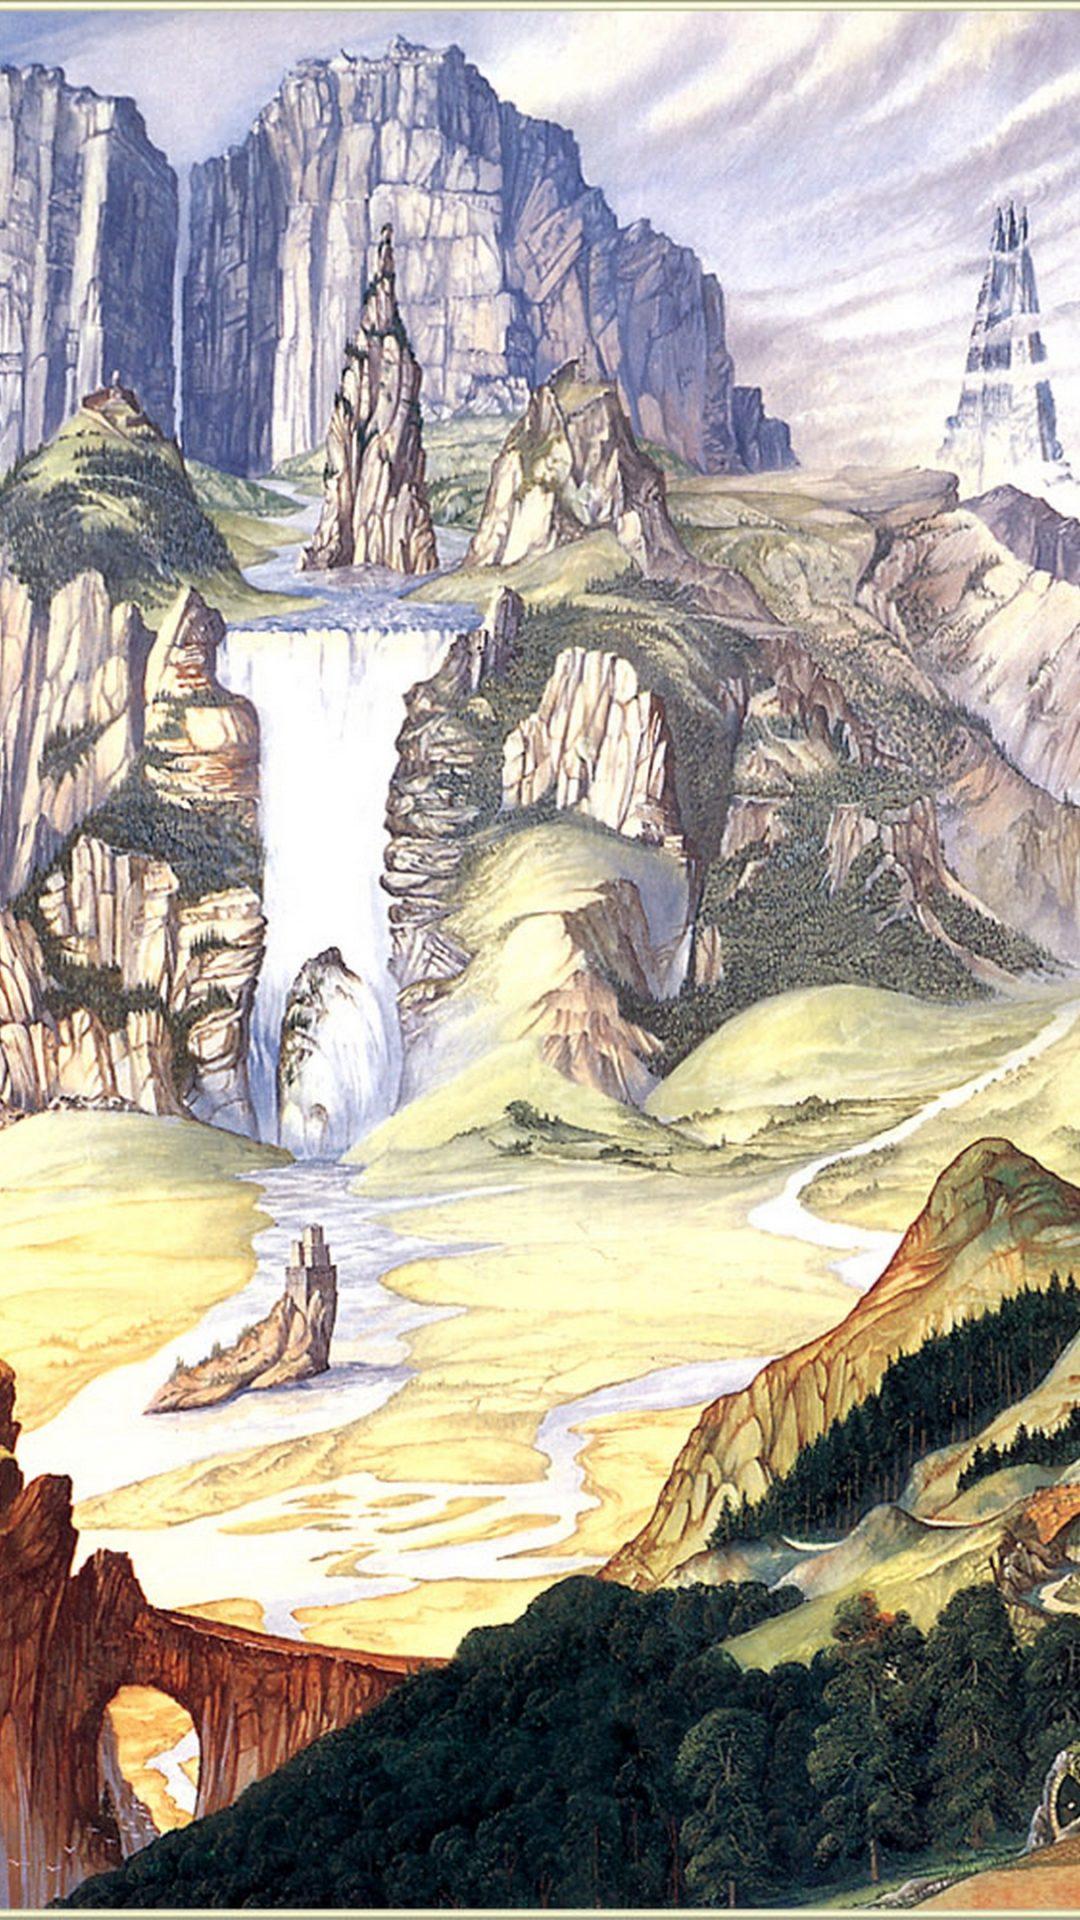 Landscape Painting Wallpaper 4k Hd Wallpaper Background